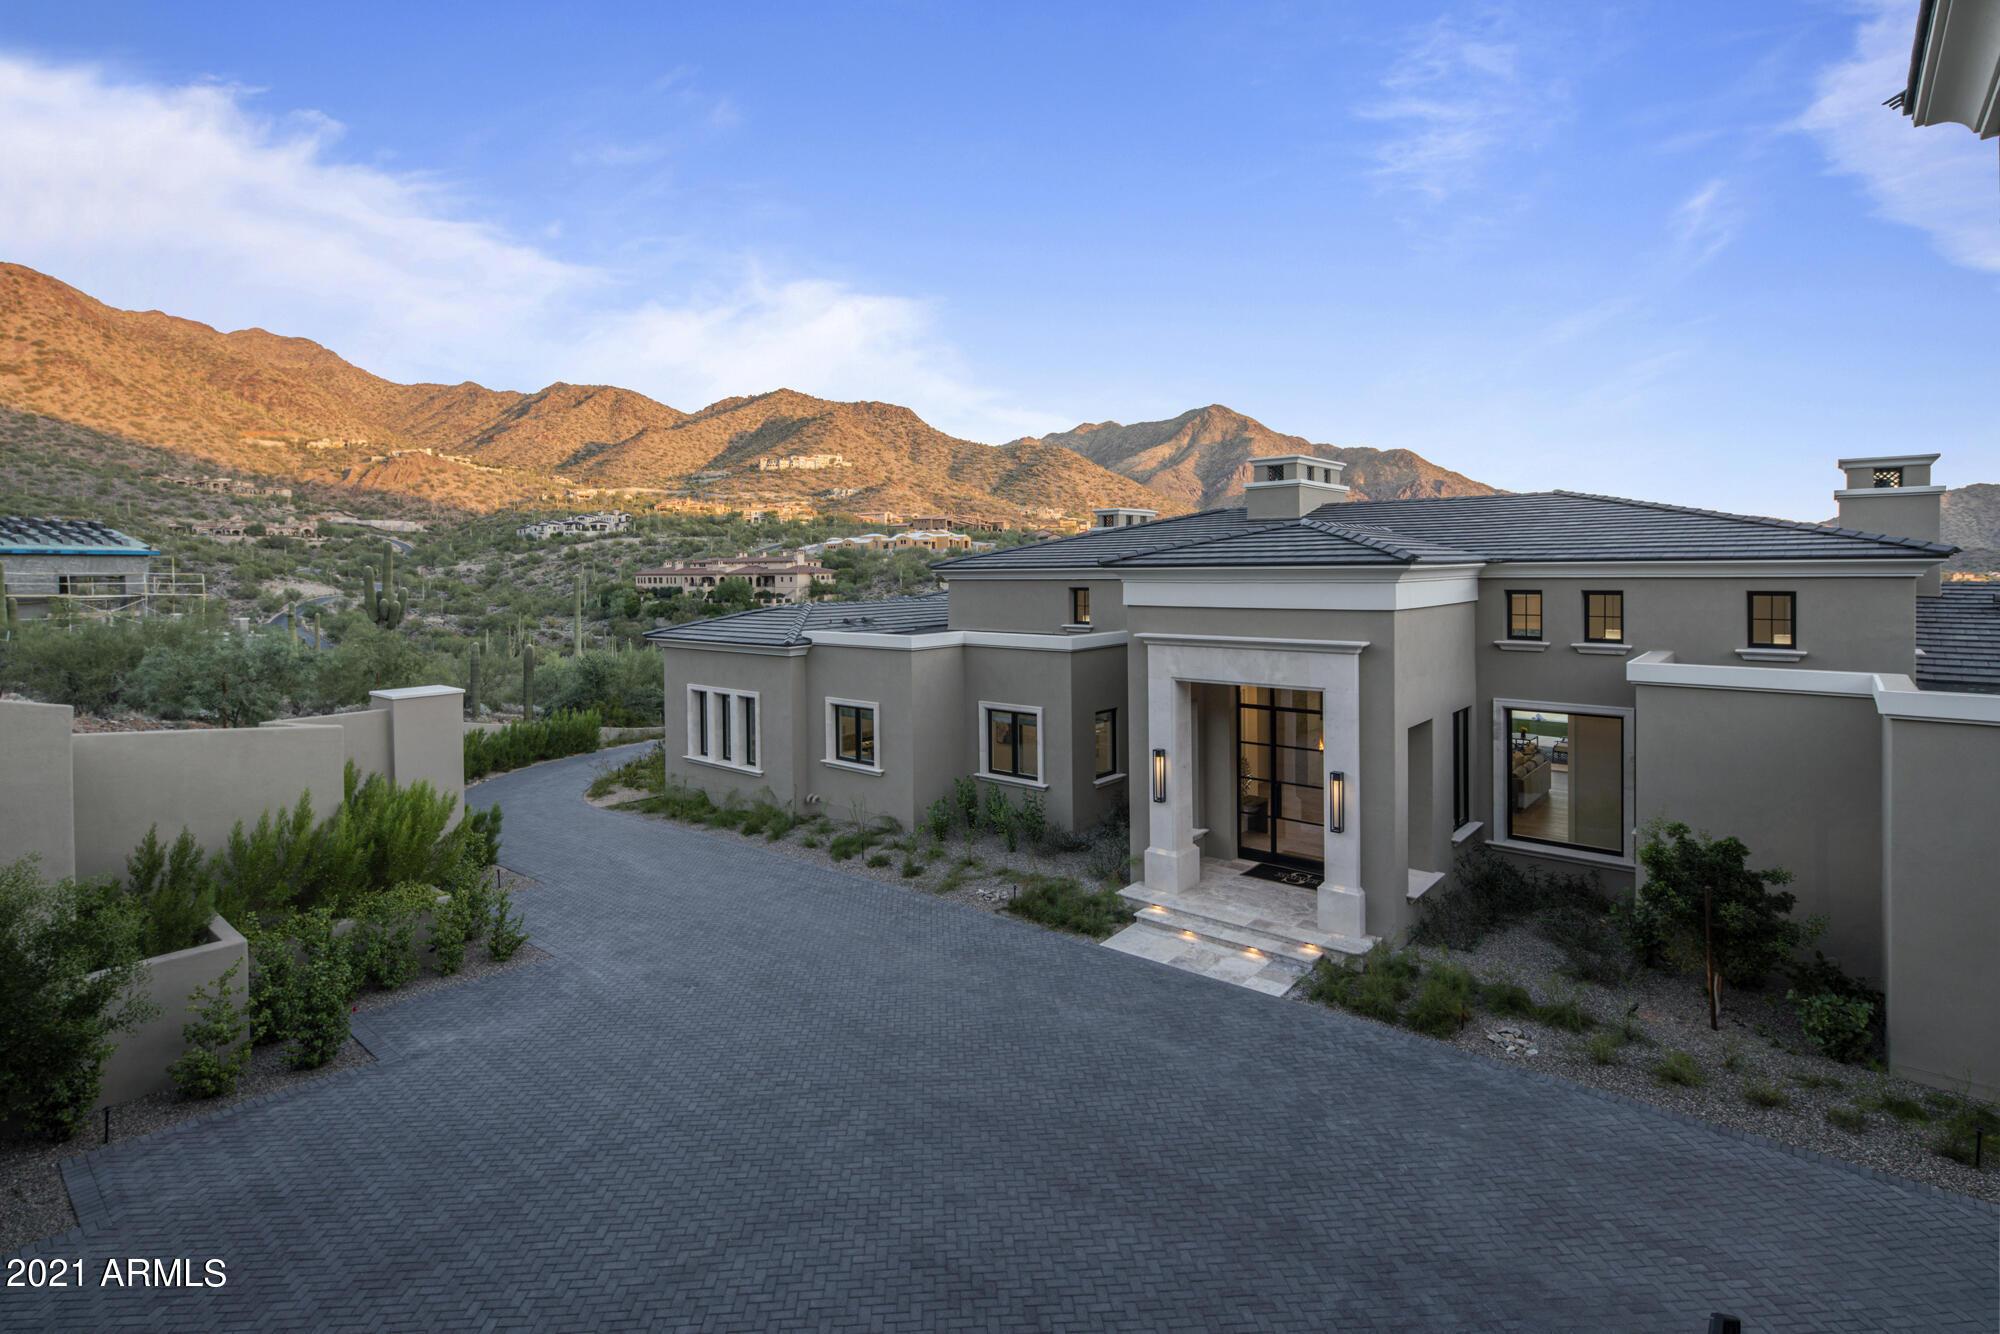 MLS 6311940 10804 E CANYON CROSS Way, Scottsdale, AZ 85255 Scottsdale AZ Newly Built